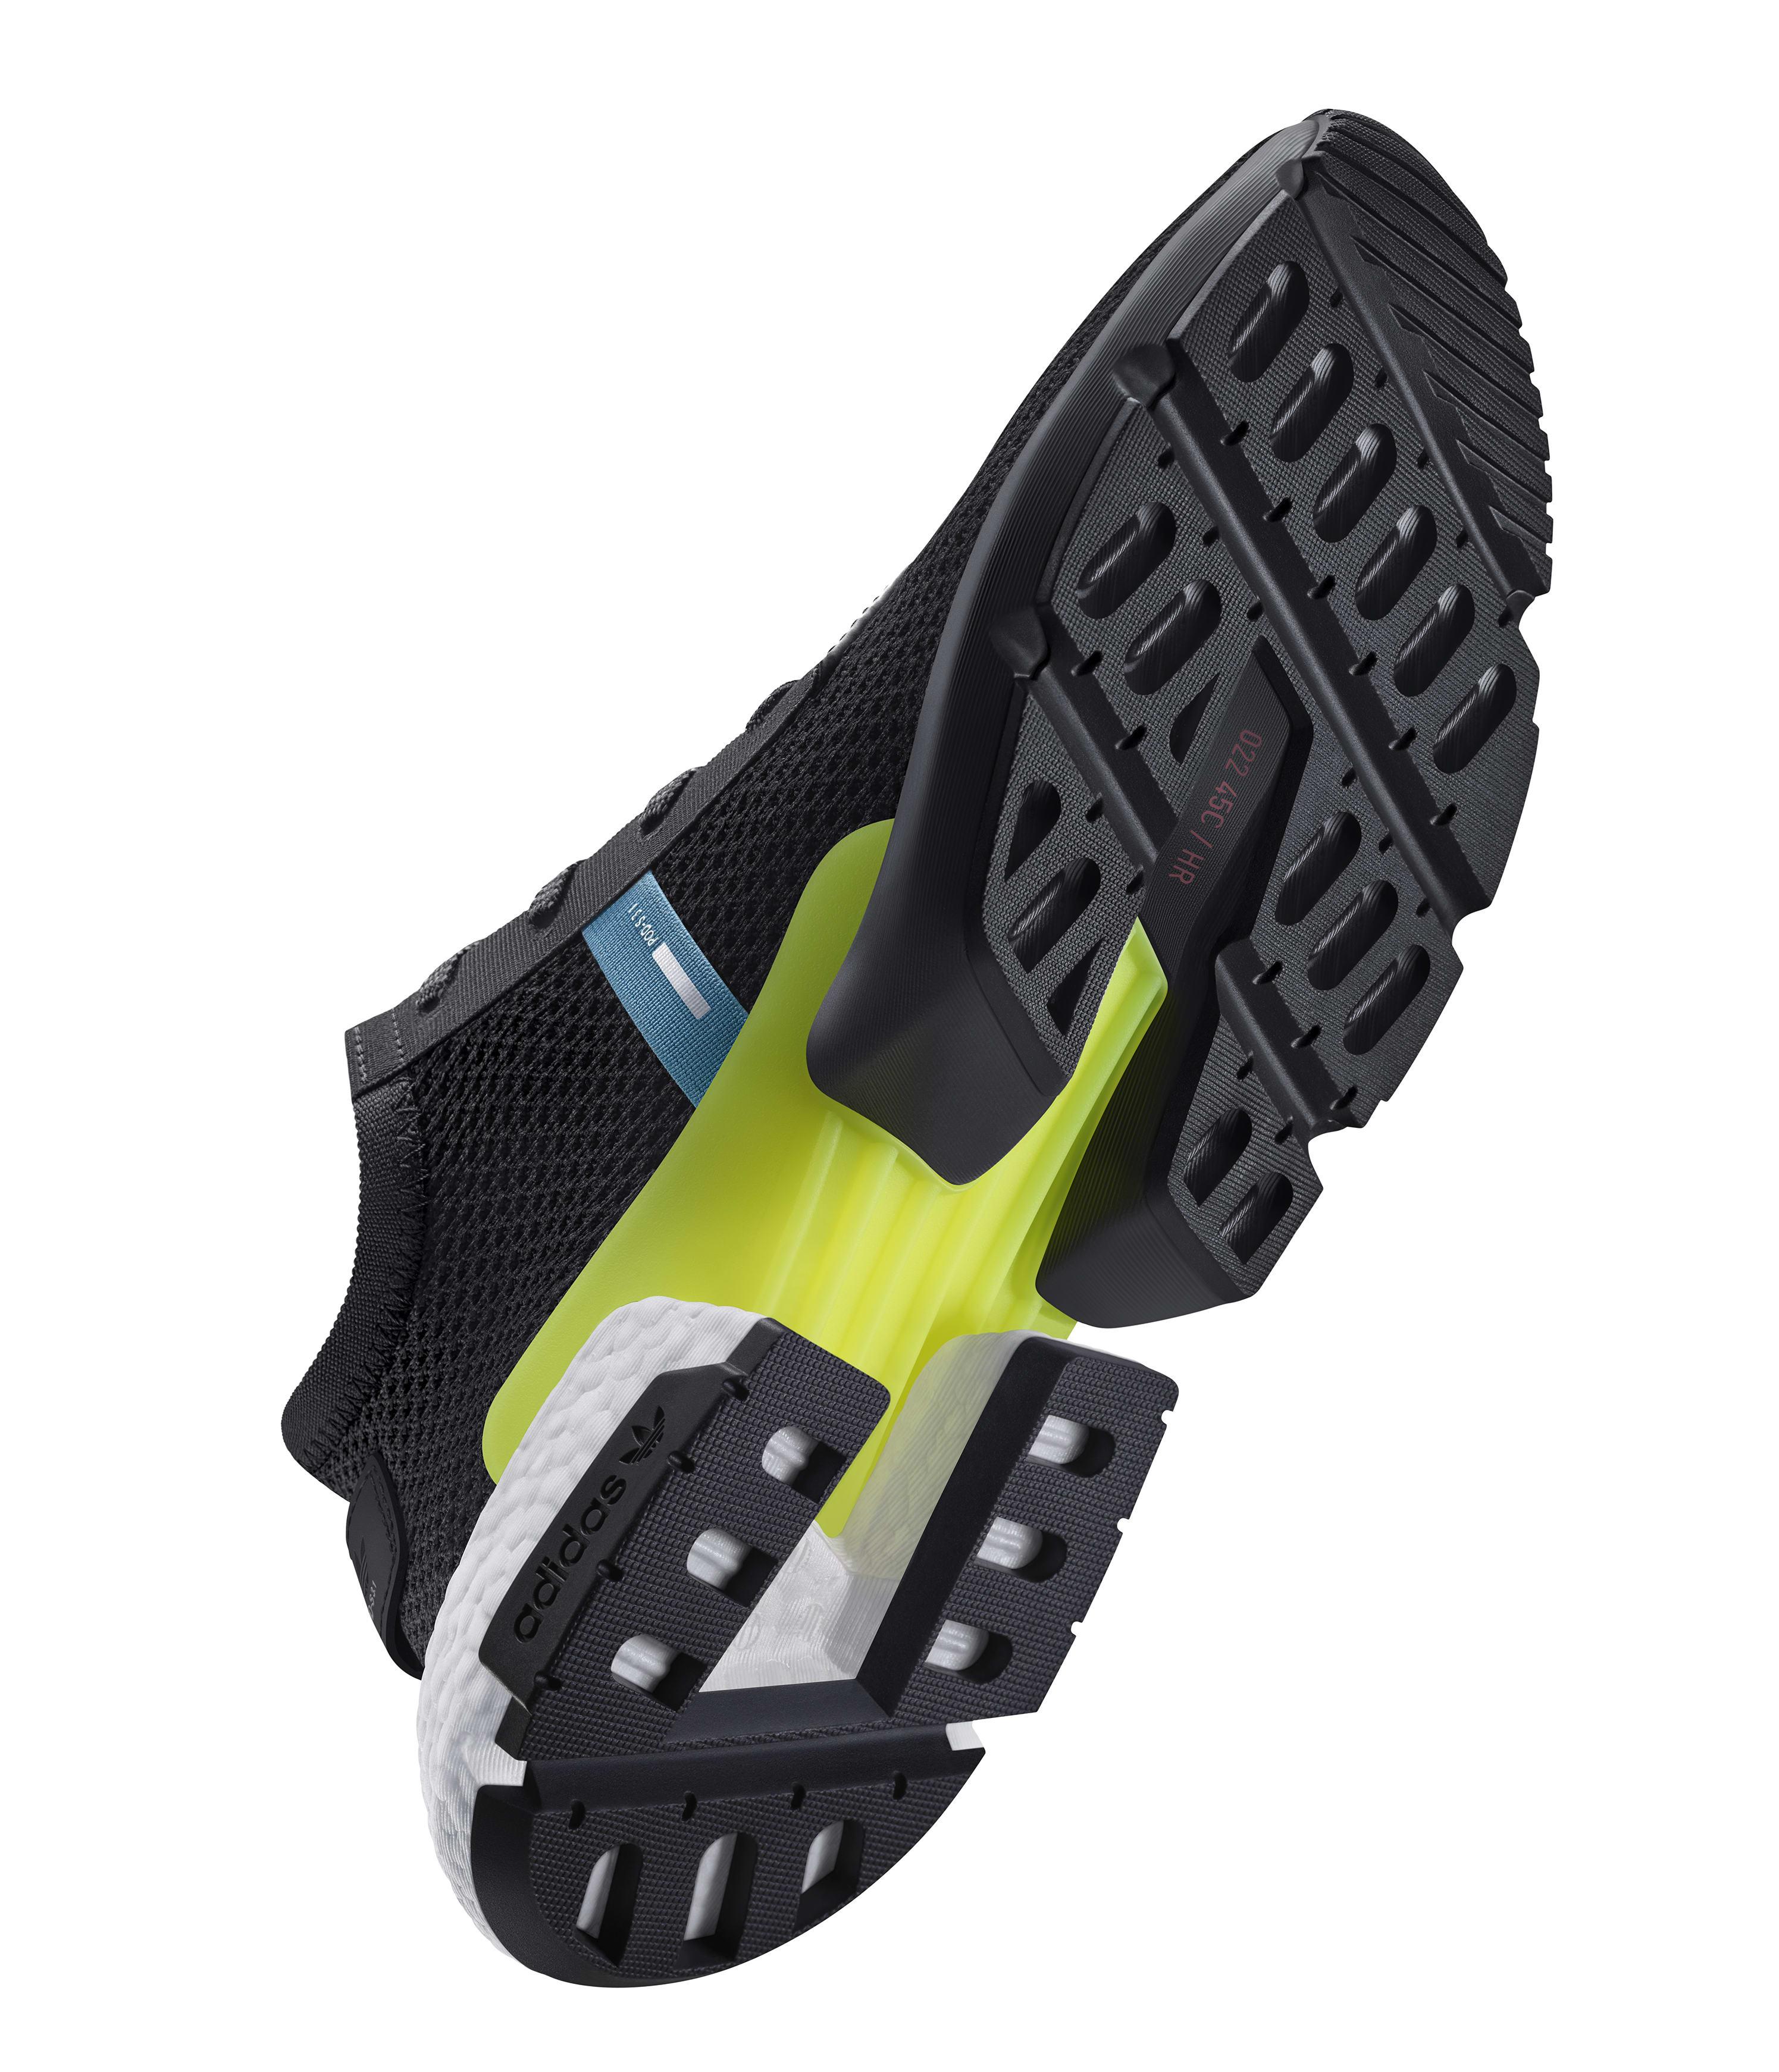 Adidas P.O.D. System AQ1059 (Bottom 1)